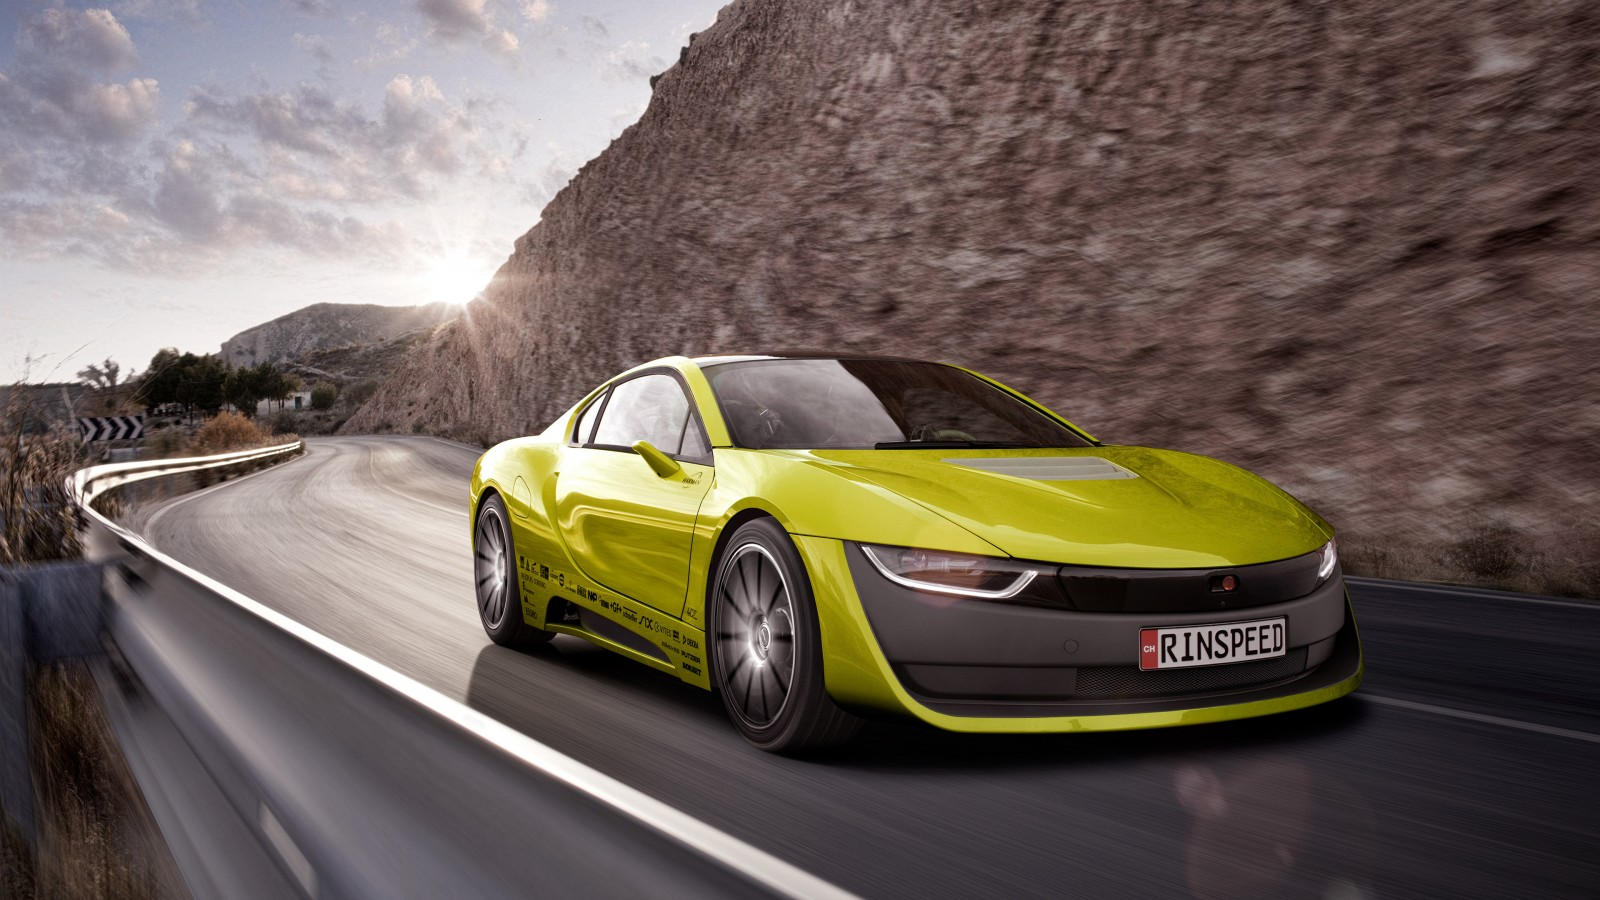 Rinspeed Etos Concept Self Driving Car Wallpaper   HD Car ...